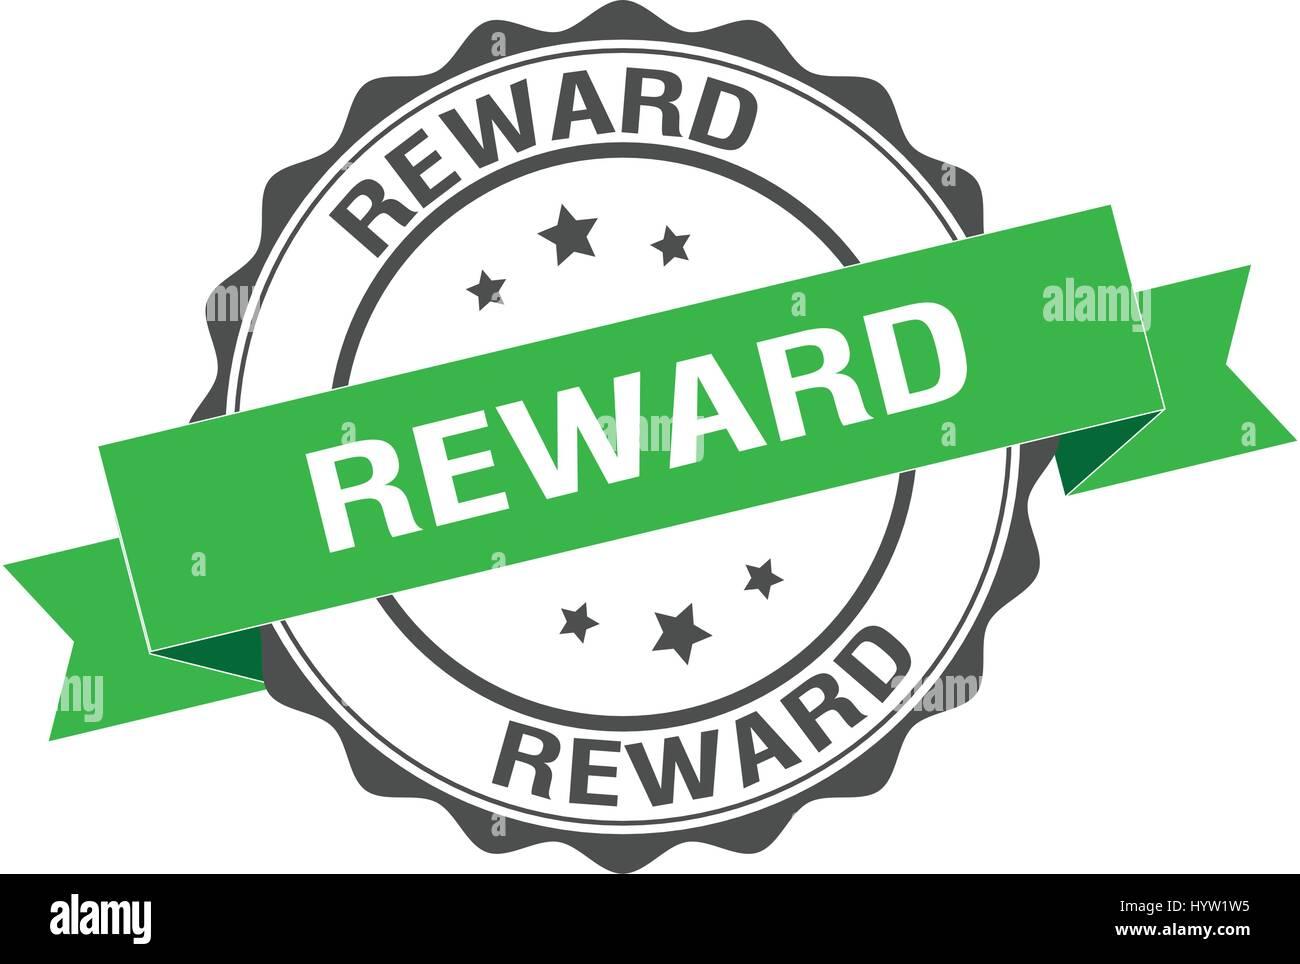 Reward stamp illustration - Stock Image